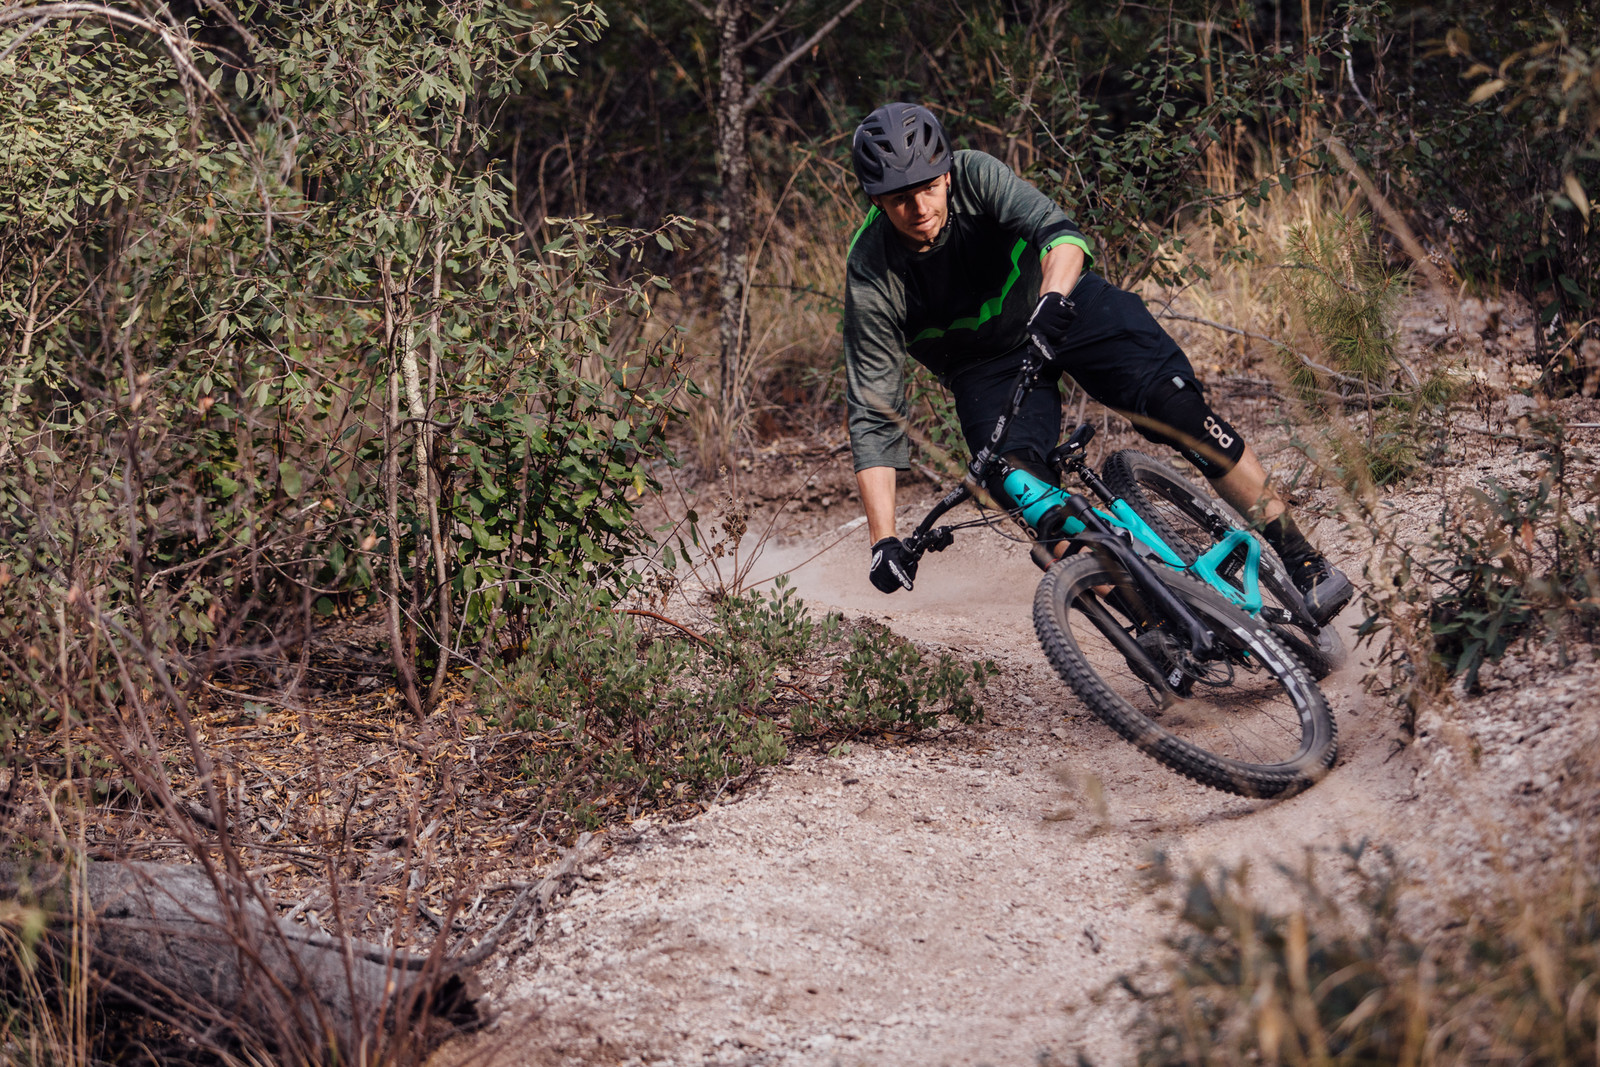 Evil The Calling Eagle X0 - 2017 Vital MTB Test Sessions - Evil The Calling Eagle X0 - 2017 Vital MTB Test Sessions - Mountain Biking Pictures - Vital MTB